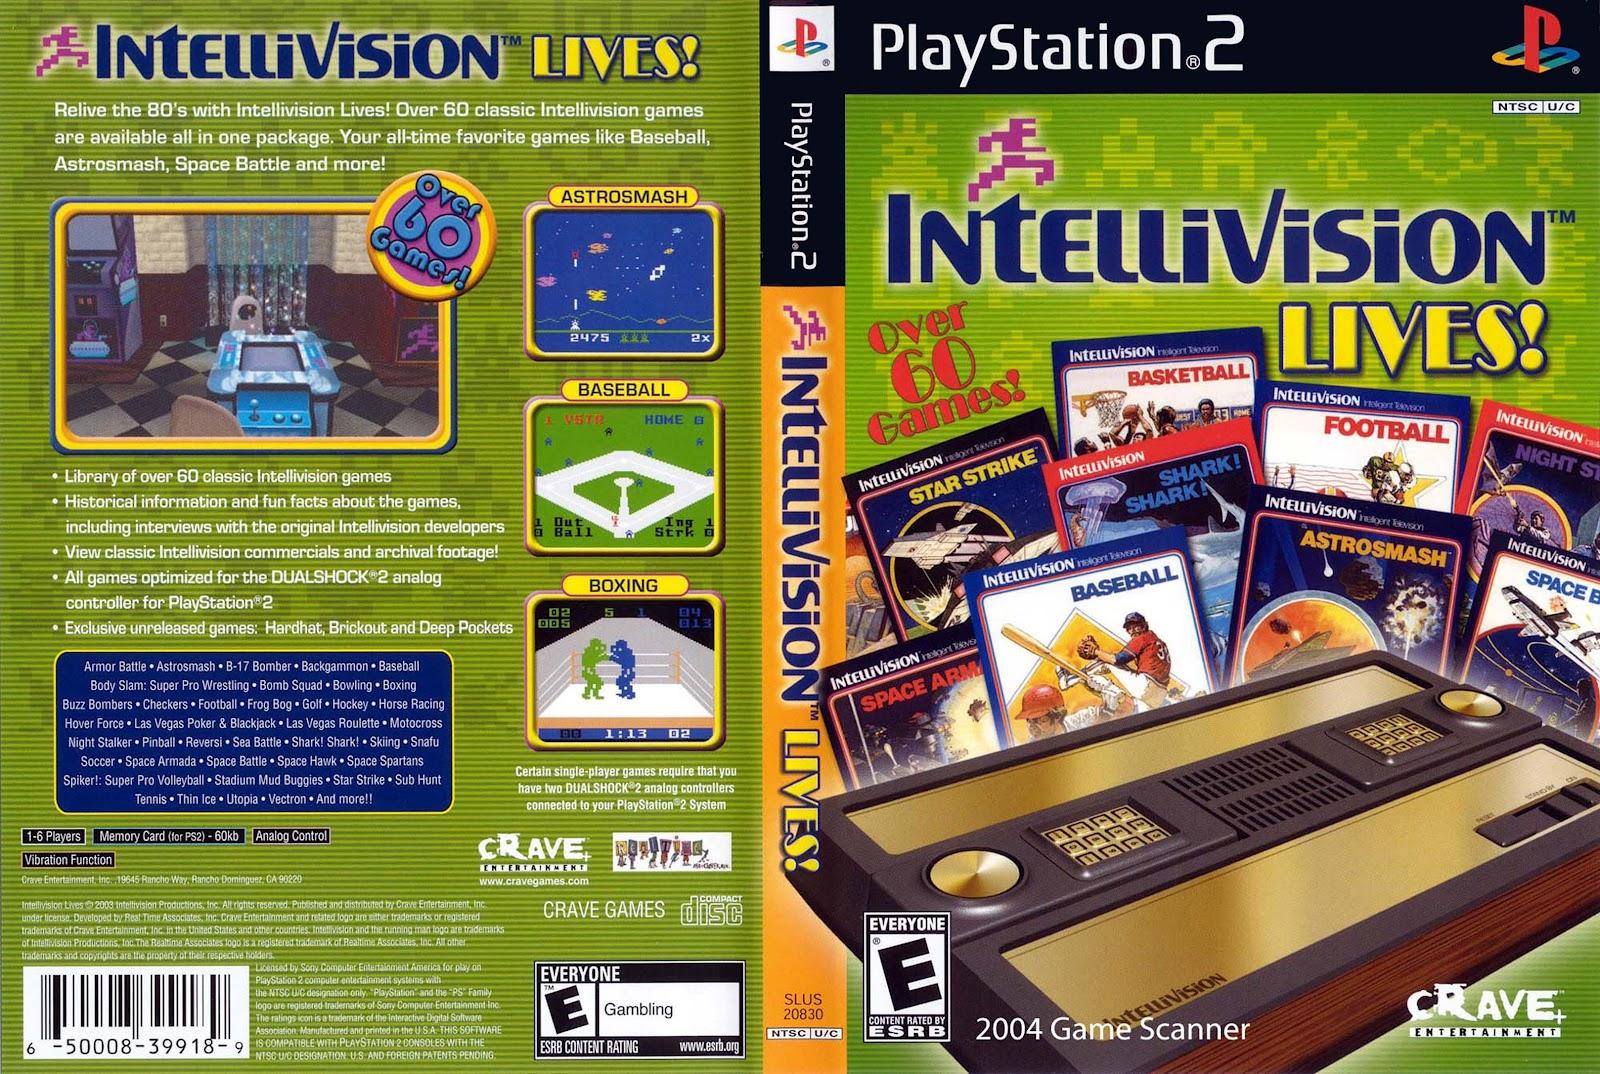 End PS2 Games Melhor Blog de PS2: Intellivision Lives! – PS2